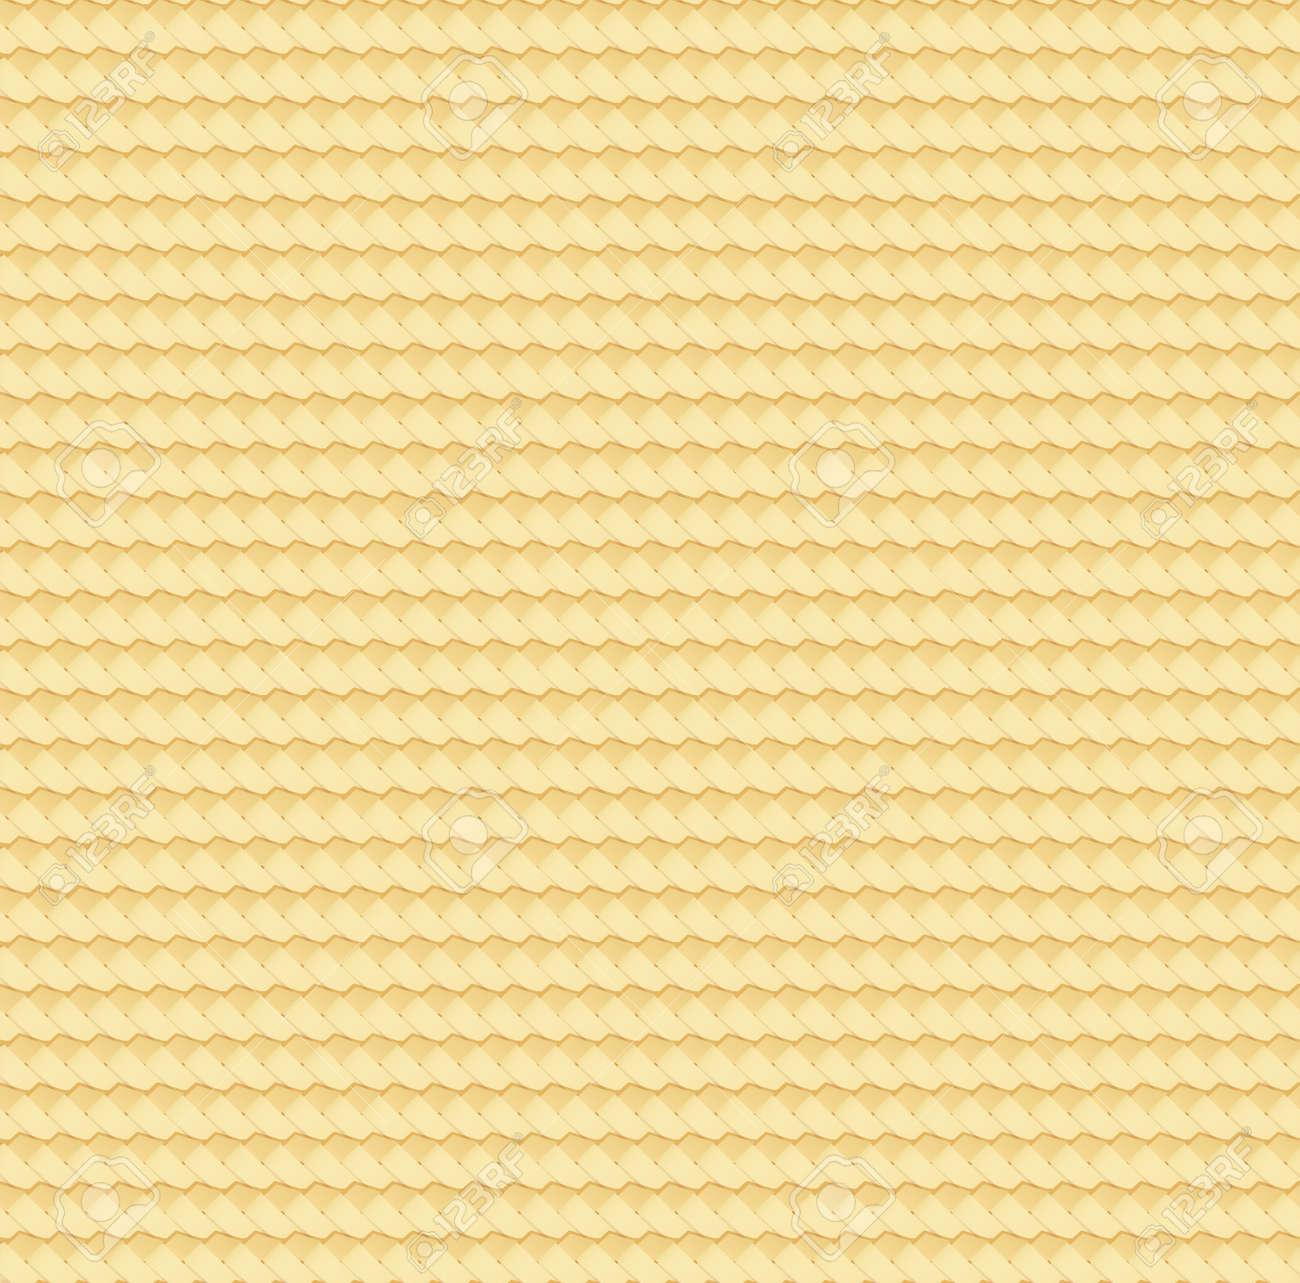 Straw abstract texture. Rattan wattled mat. Natural bamboo seamless pattern. Basket wicker surface. Wickerwork reed carpet. Vector illustration. EPS 10 - 124875364